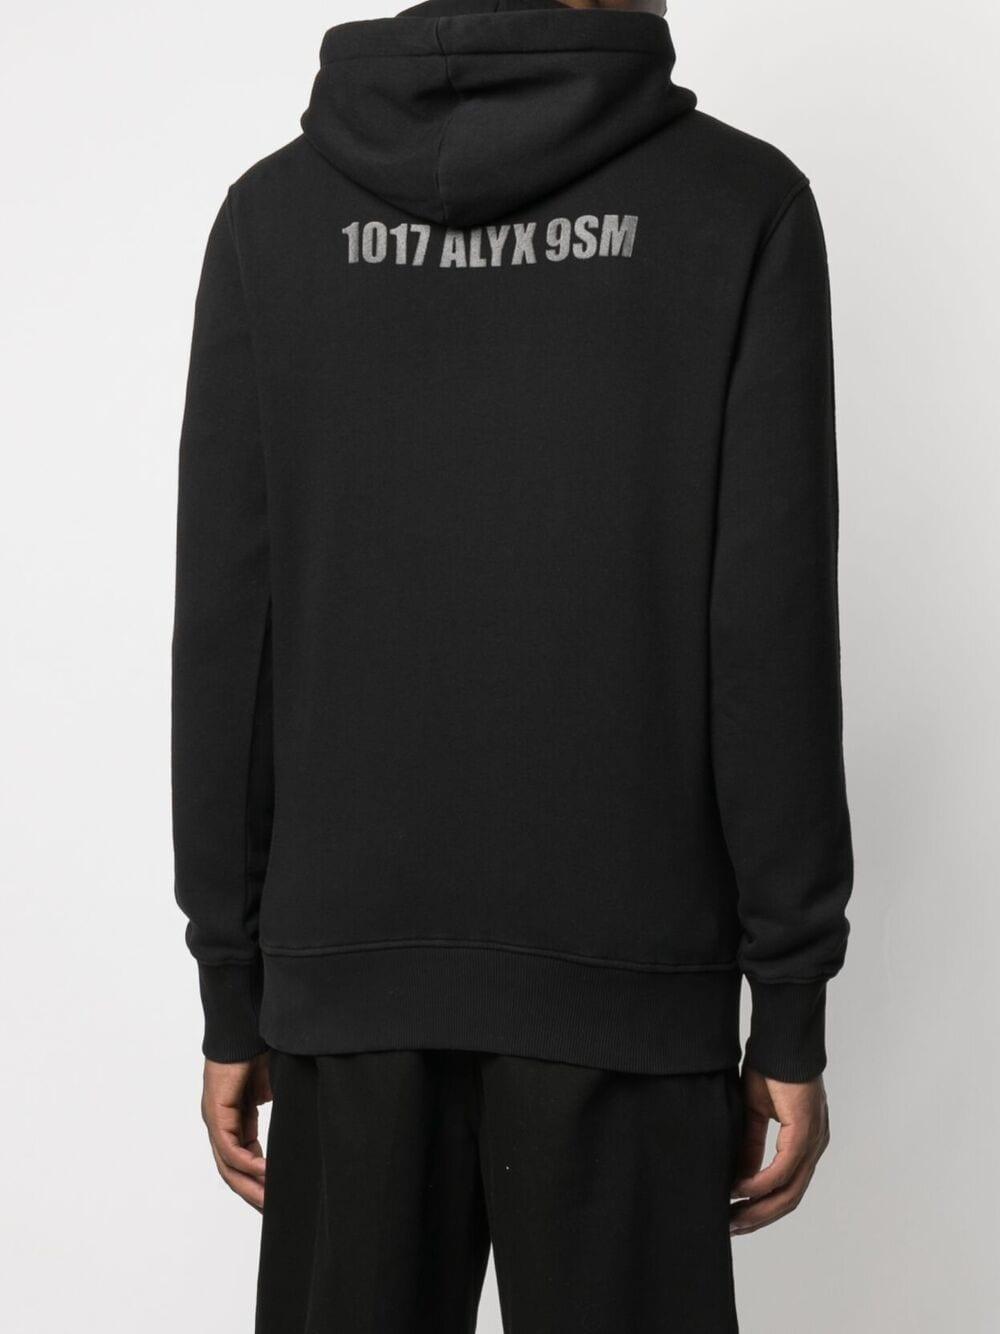 1017 Alyx 9sm logo sweatshirt man black 1017 ALYX 9SM | Sweatshirts | AAMSW0097FA01BLK0001